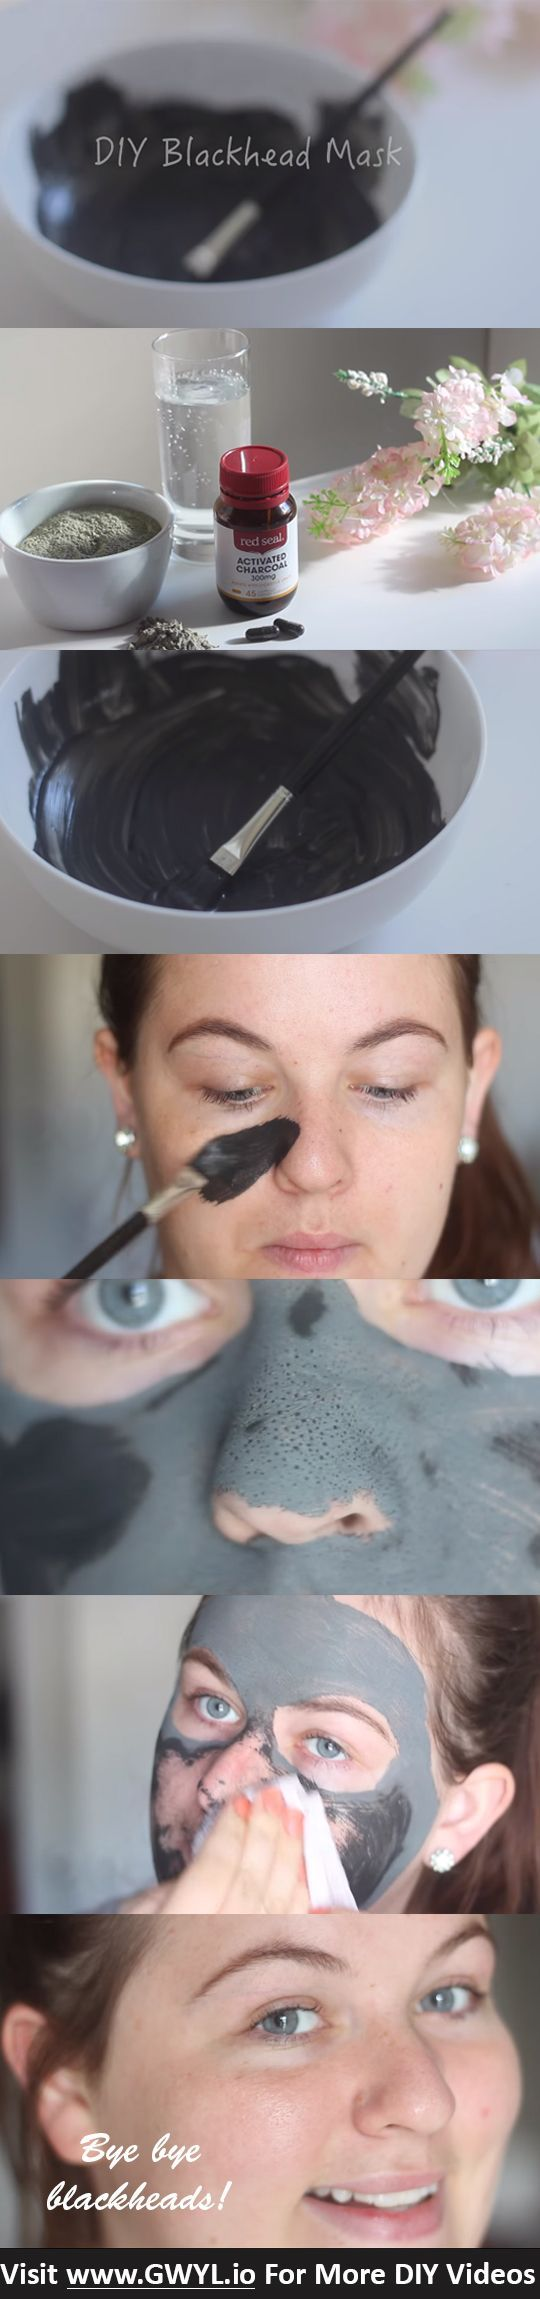 pig nose blackhead strip instructions